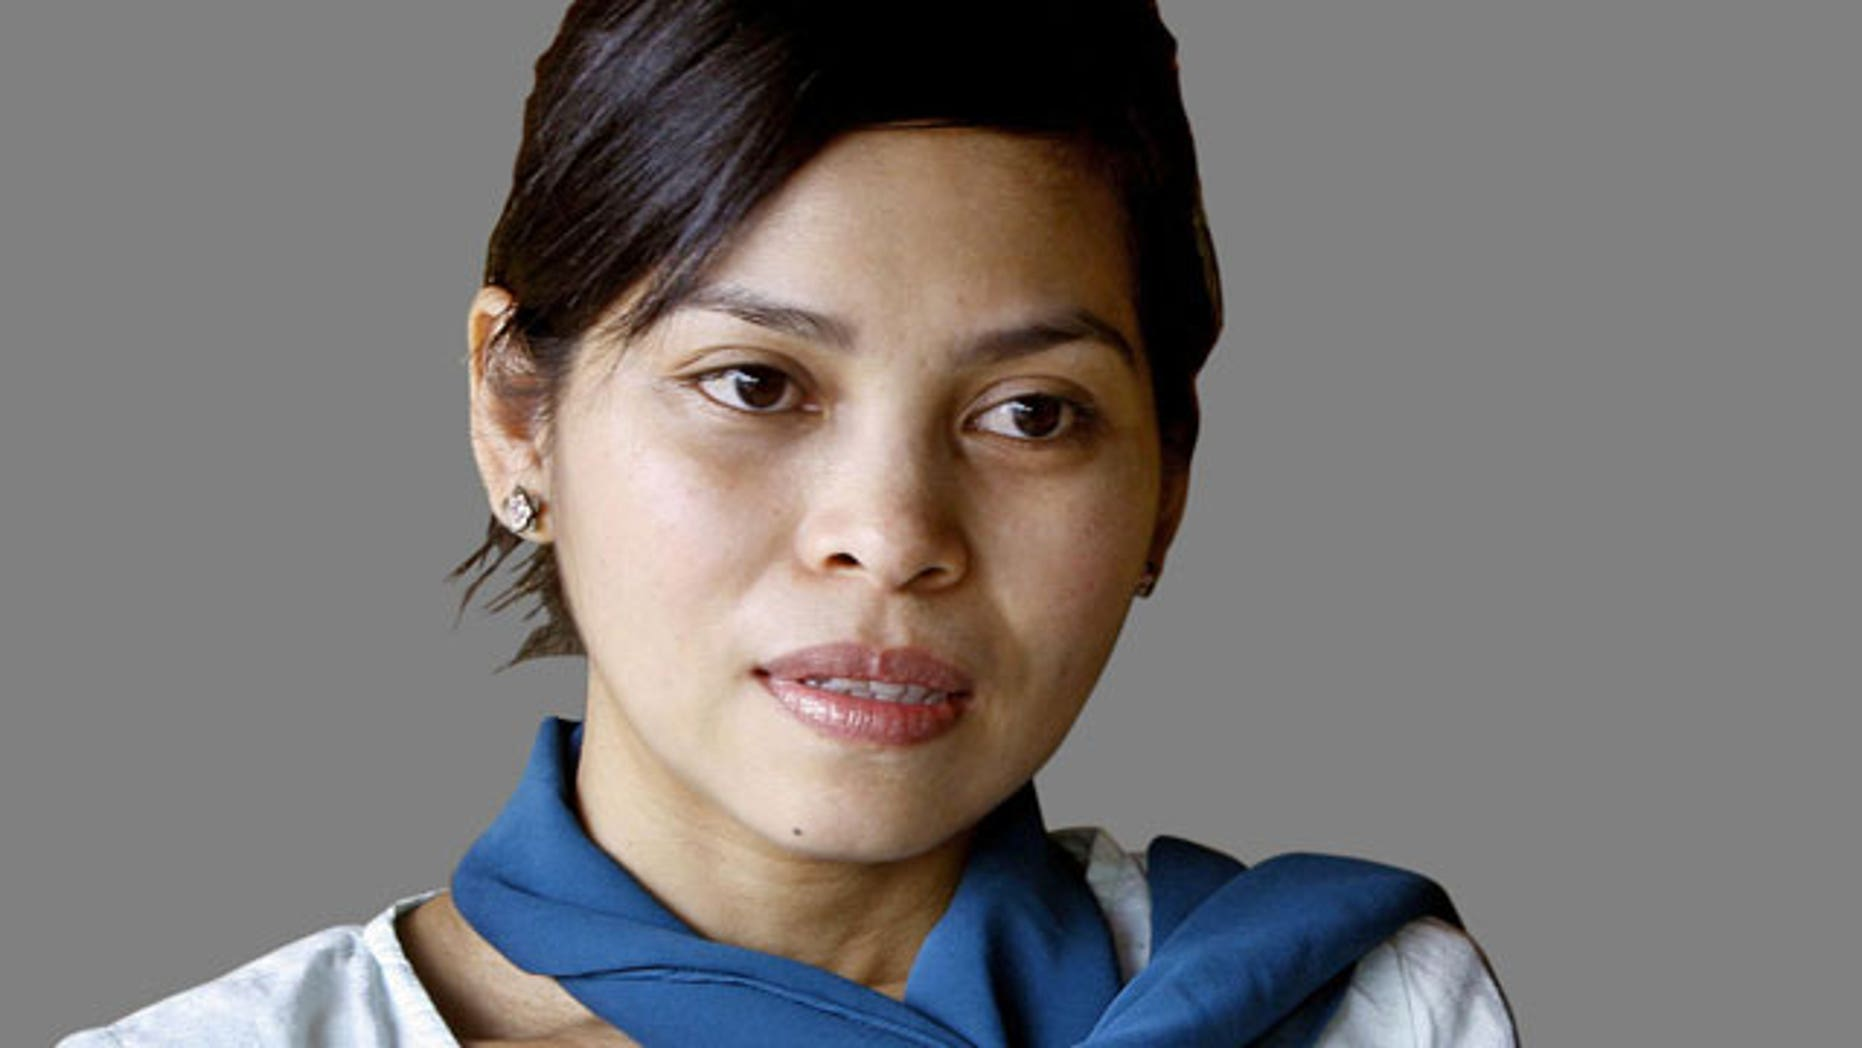 Muslim model, Kartika Sari Dewi Shukarno, who faced caning for drinking beer in Karai, Malaysia.